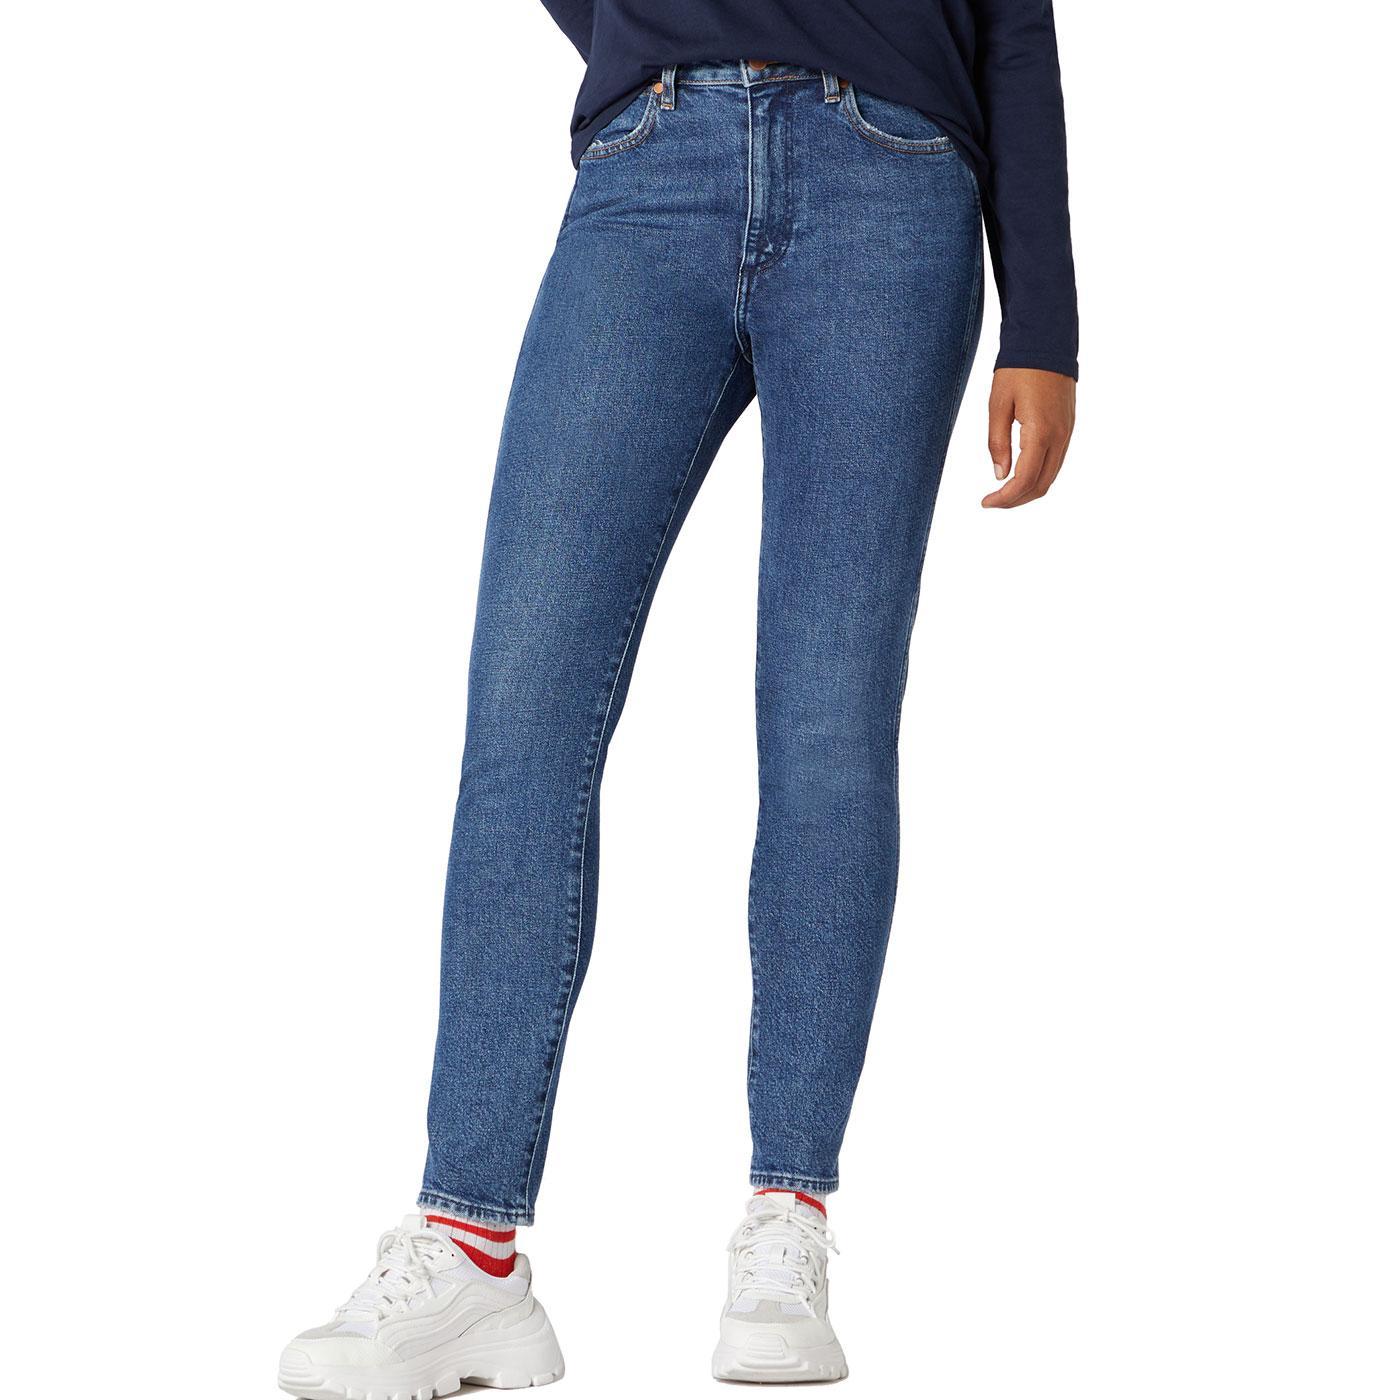 WRANGLER Women's Stonewashed Retro Skinny Jeans